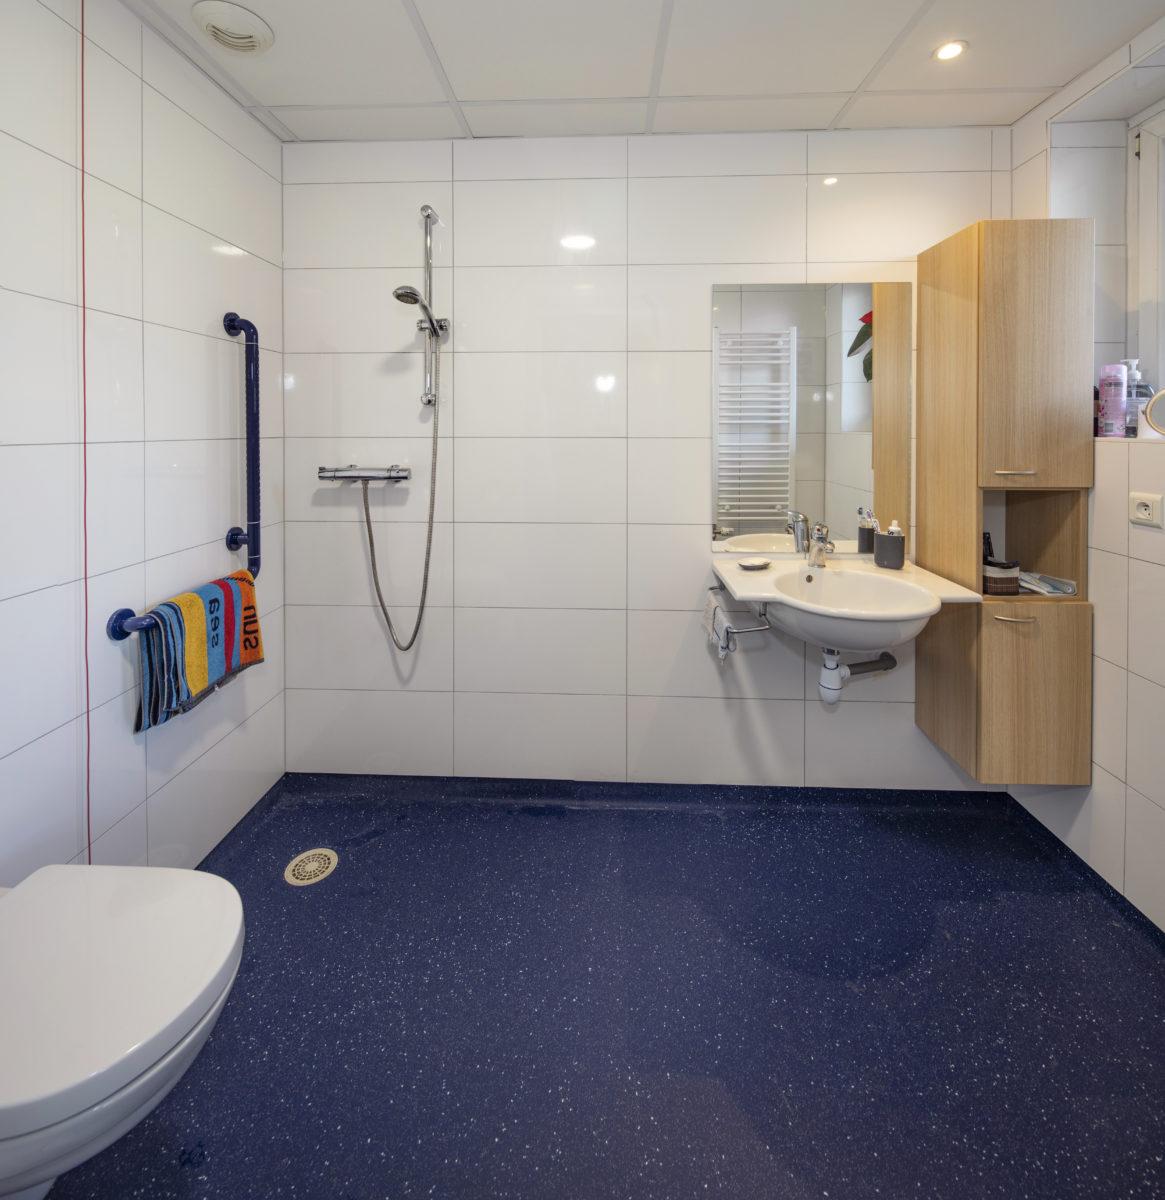 Ehpad Strasbourg Koenigshoffen salle de bain